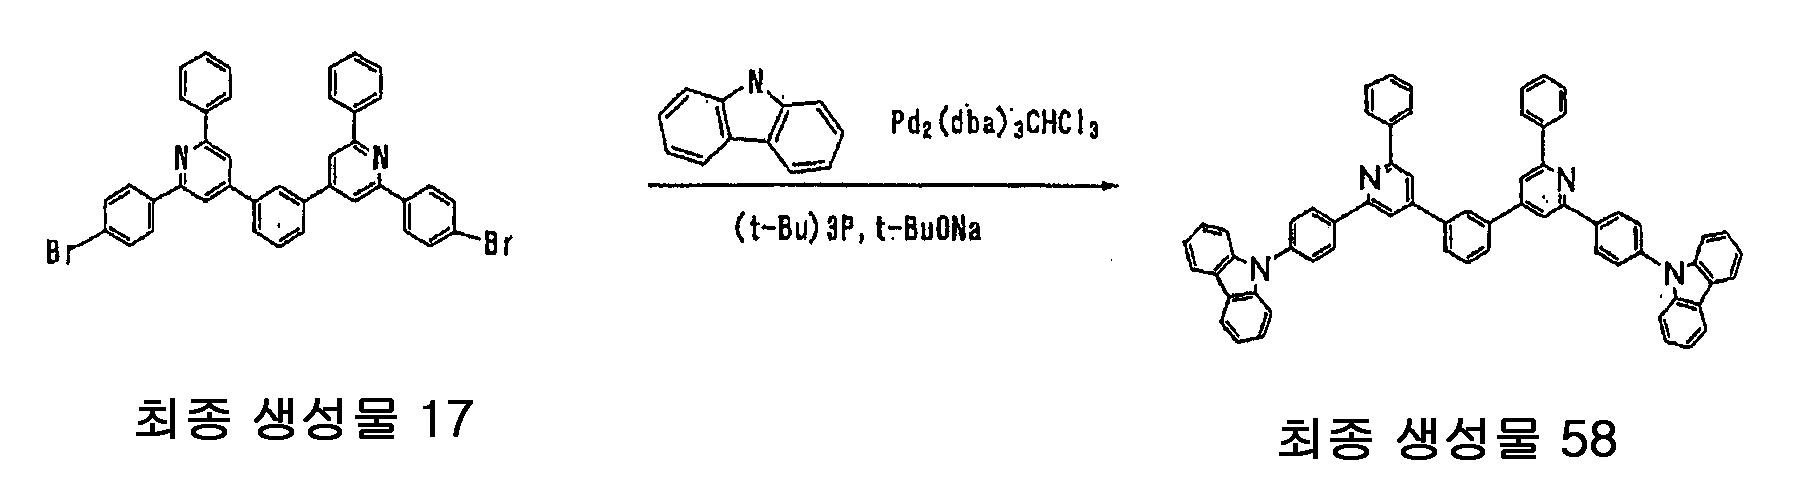 Figure 112010002231902-pat00146